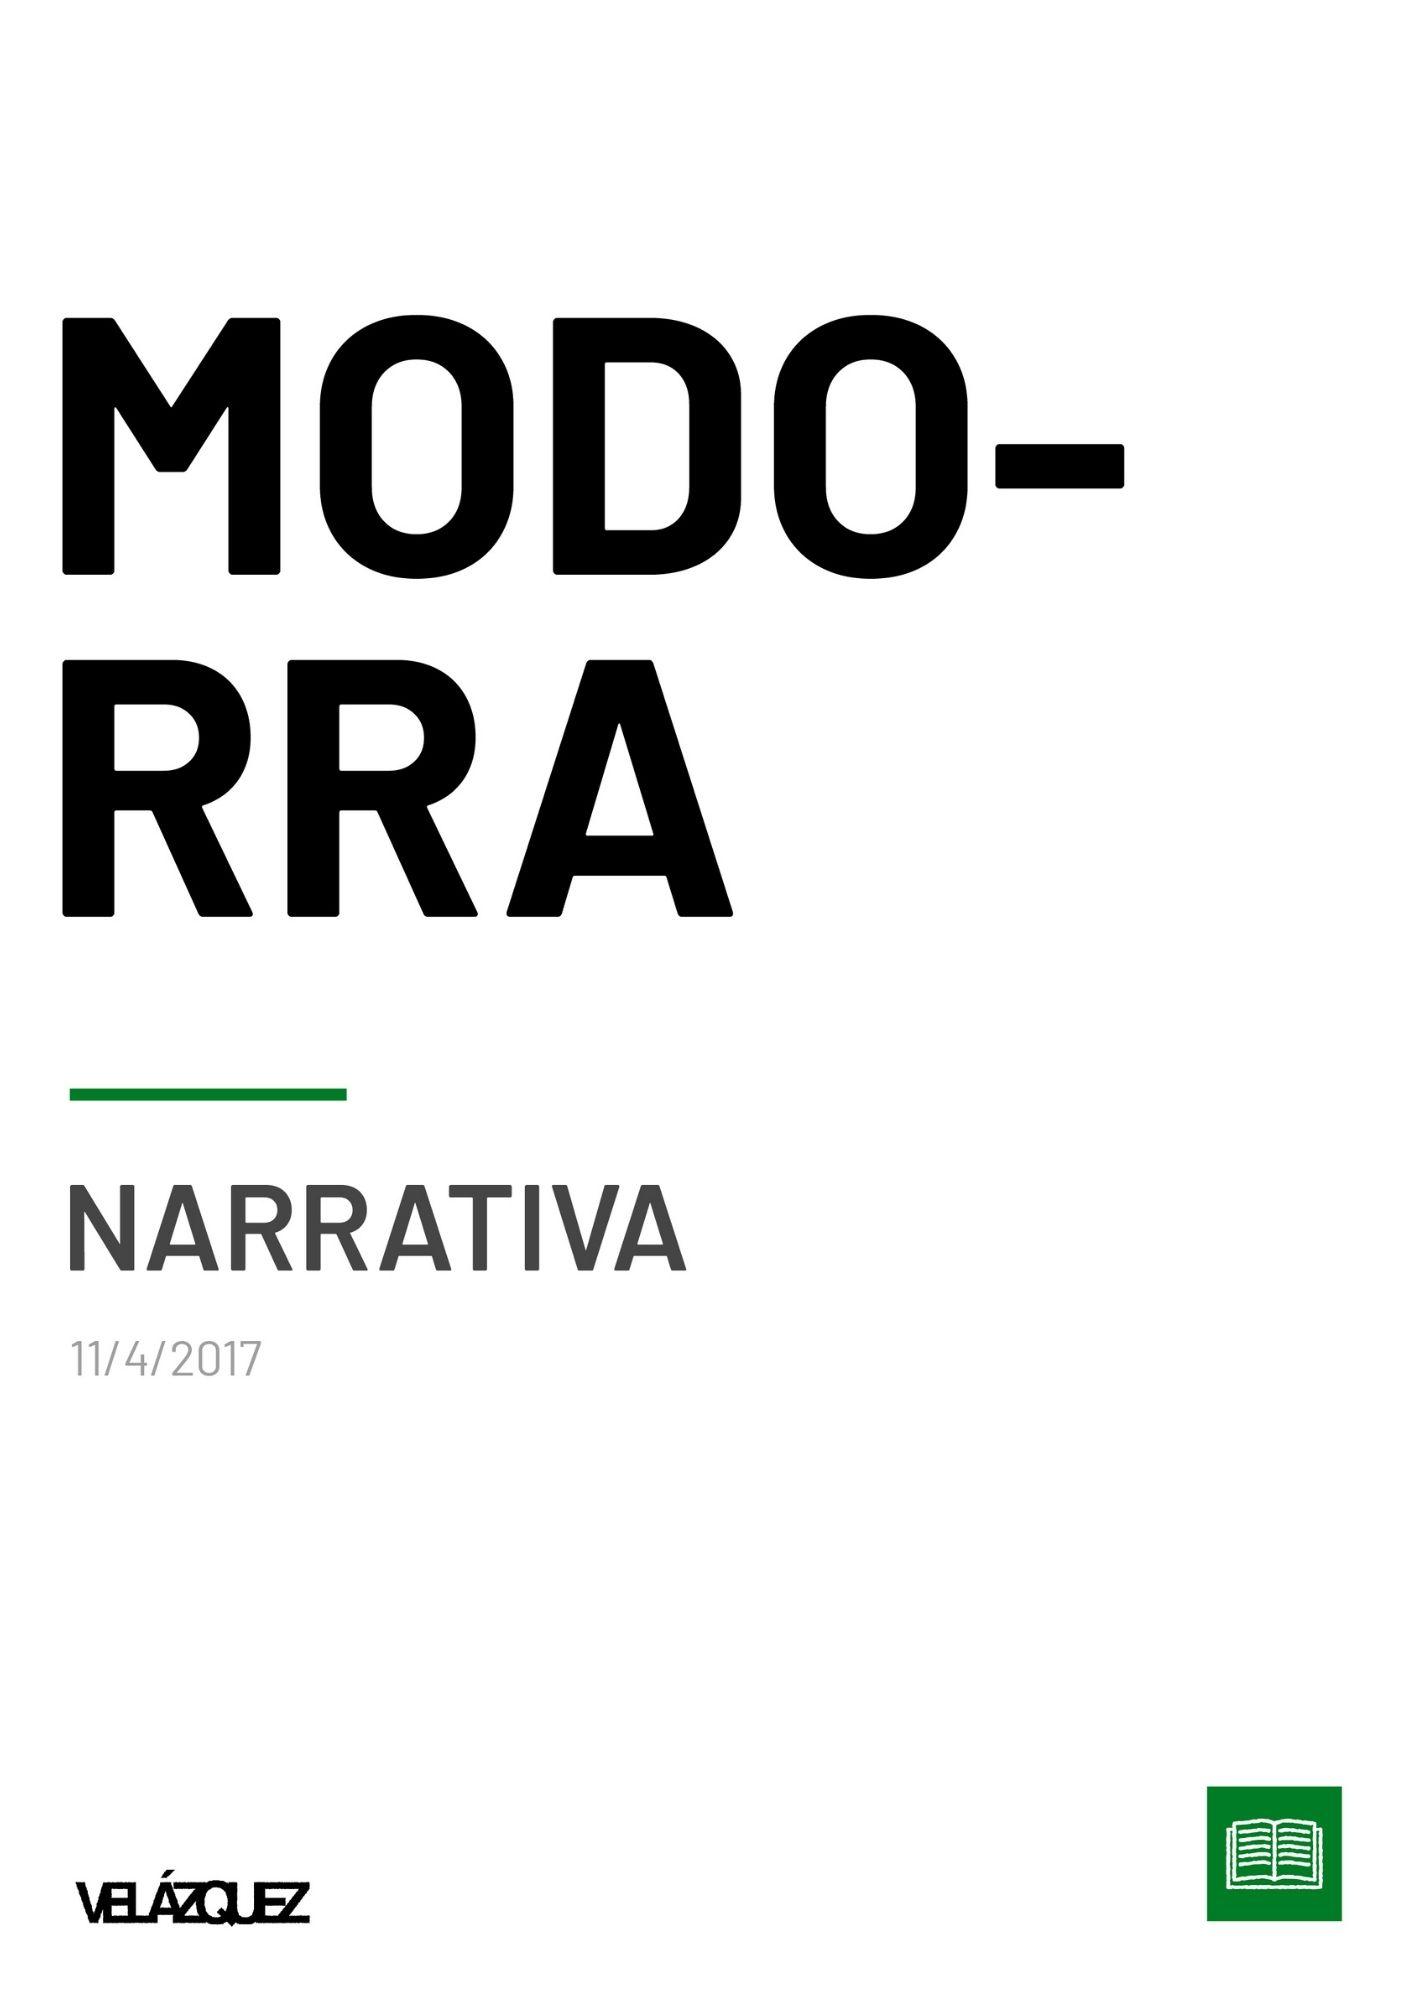 Modorra - Narrativa - Fabri Velázquez